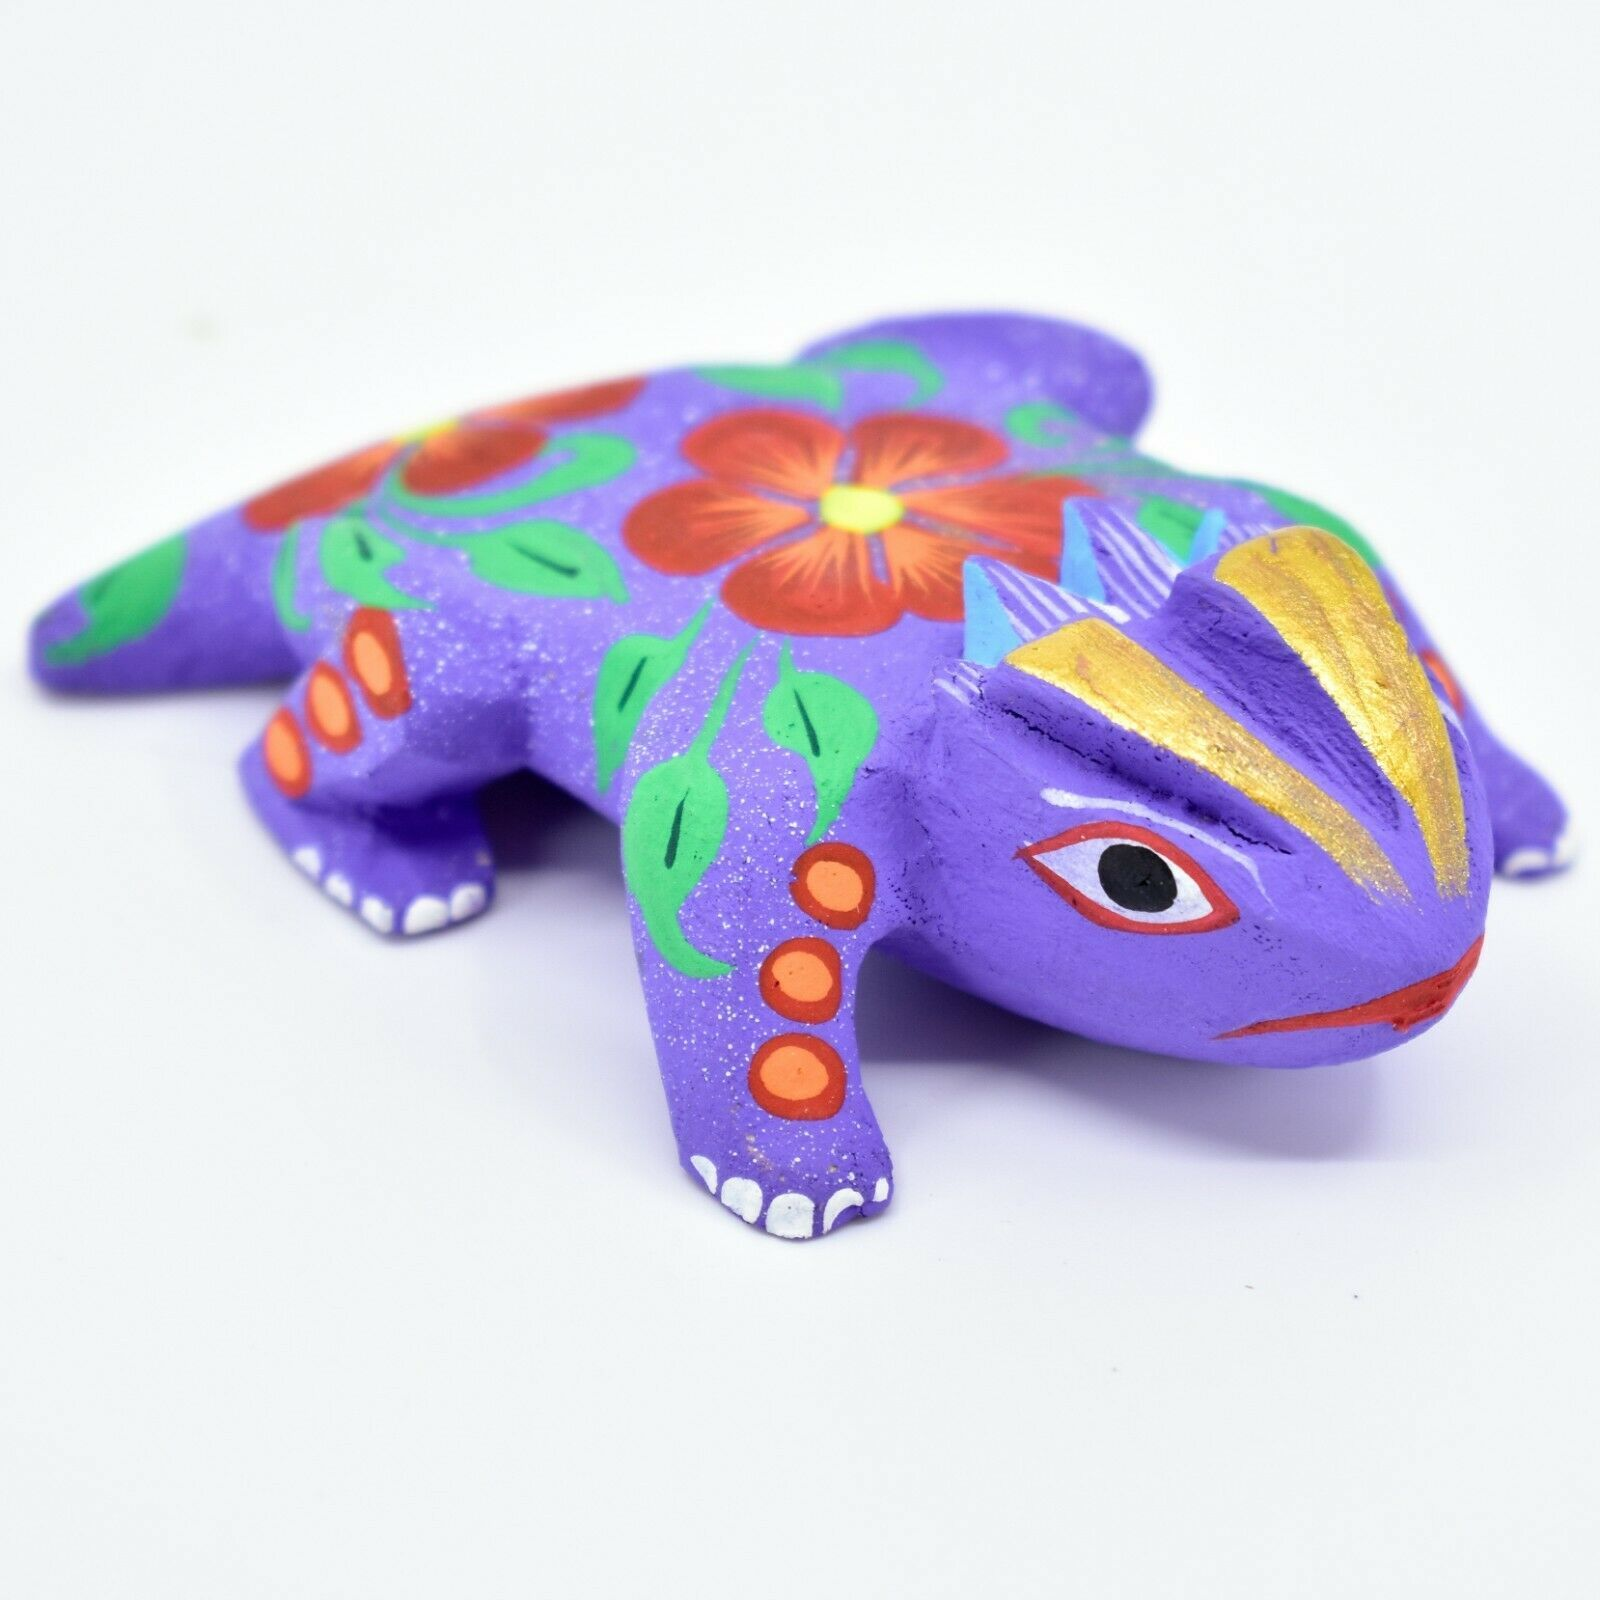 Handmade Alebrijes Oaxacan Copal Wood Carving Folk Art Horned Toad Figurine